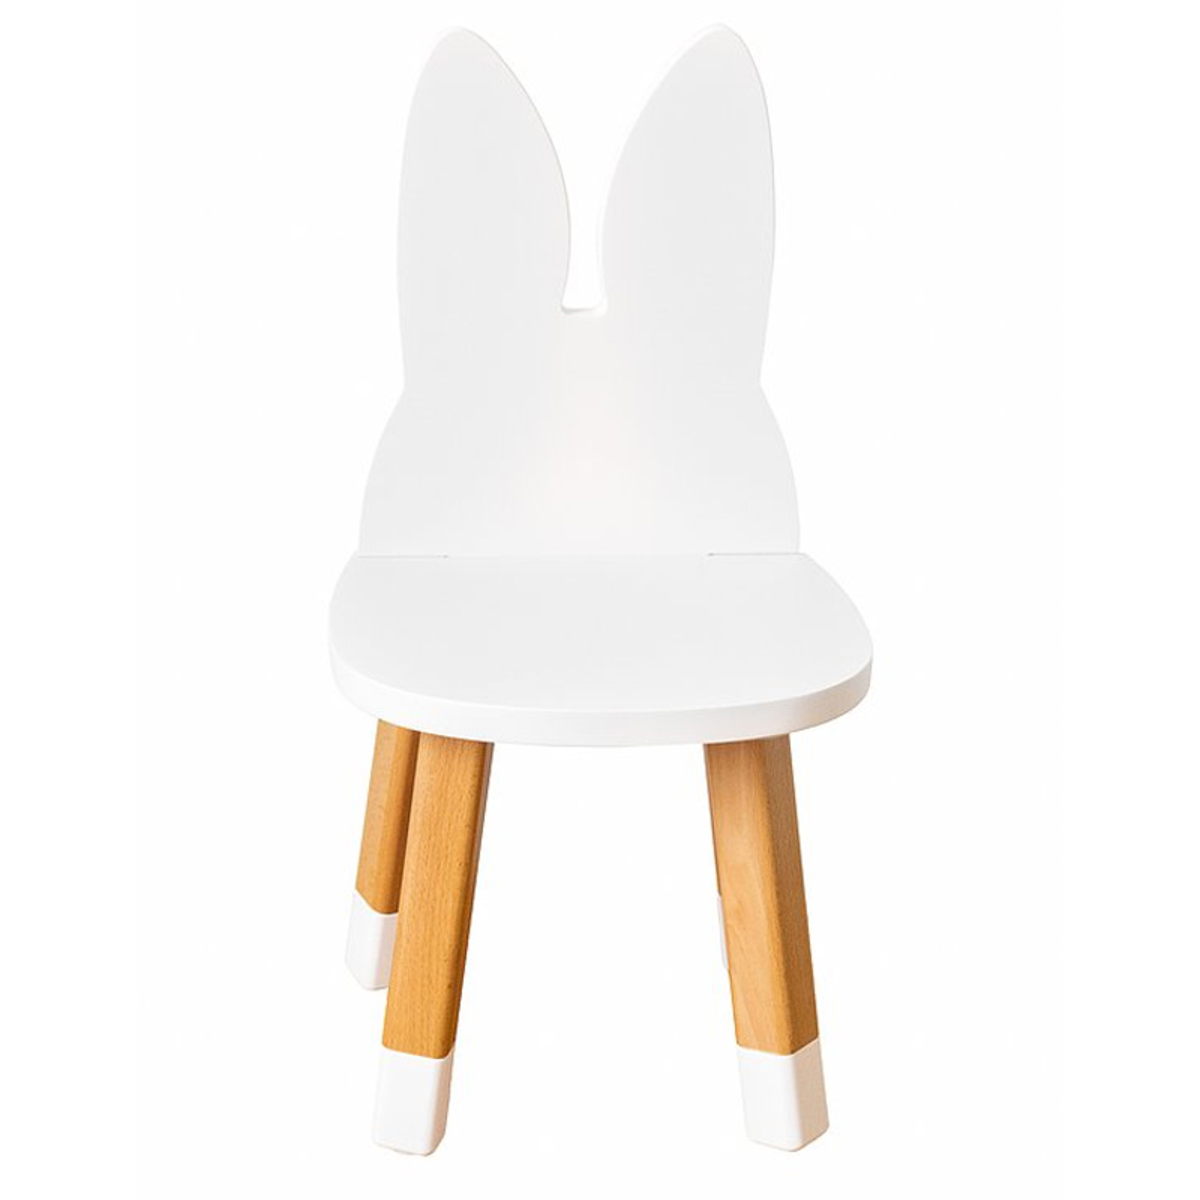 Table & Chaise Chaise Lapin - Blanc Chaise Lapin - Blanc